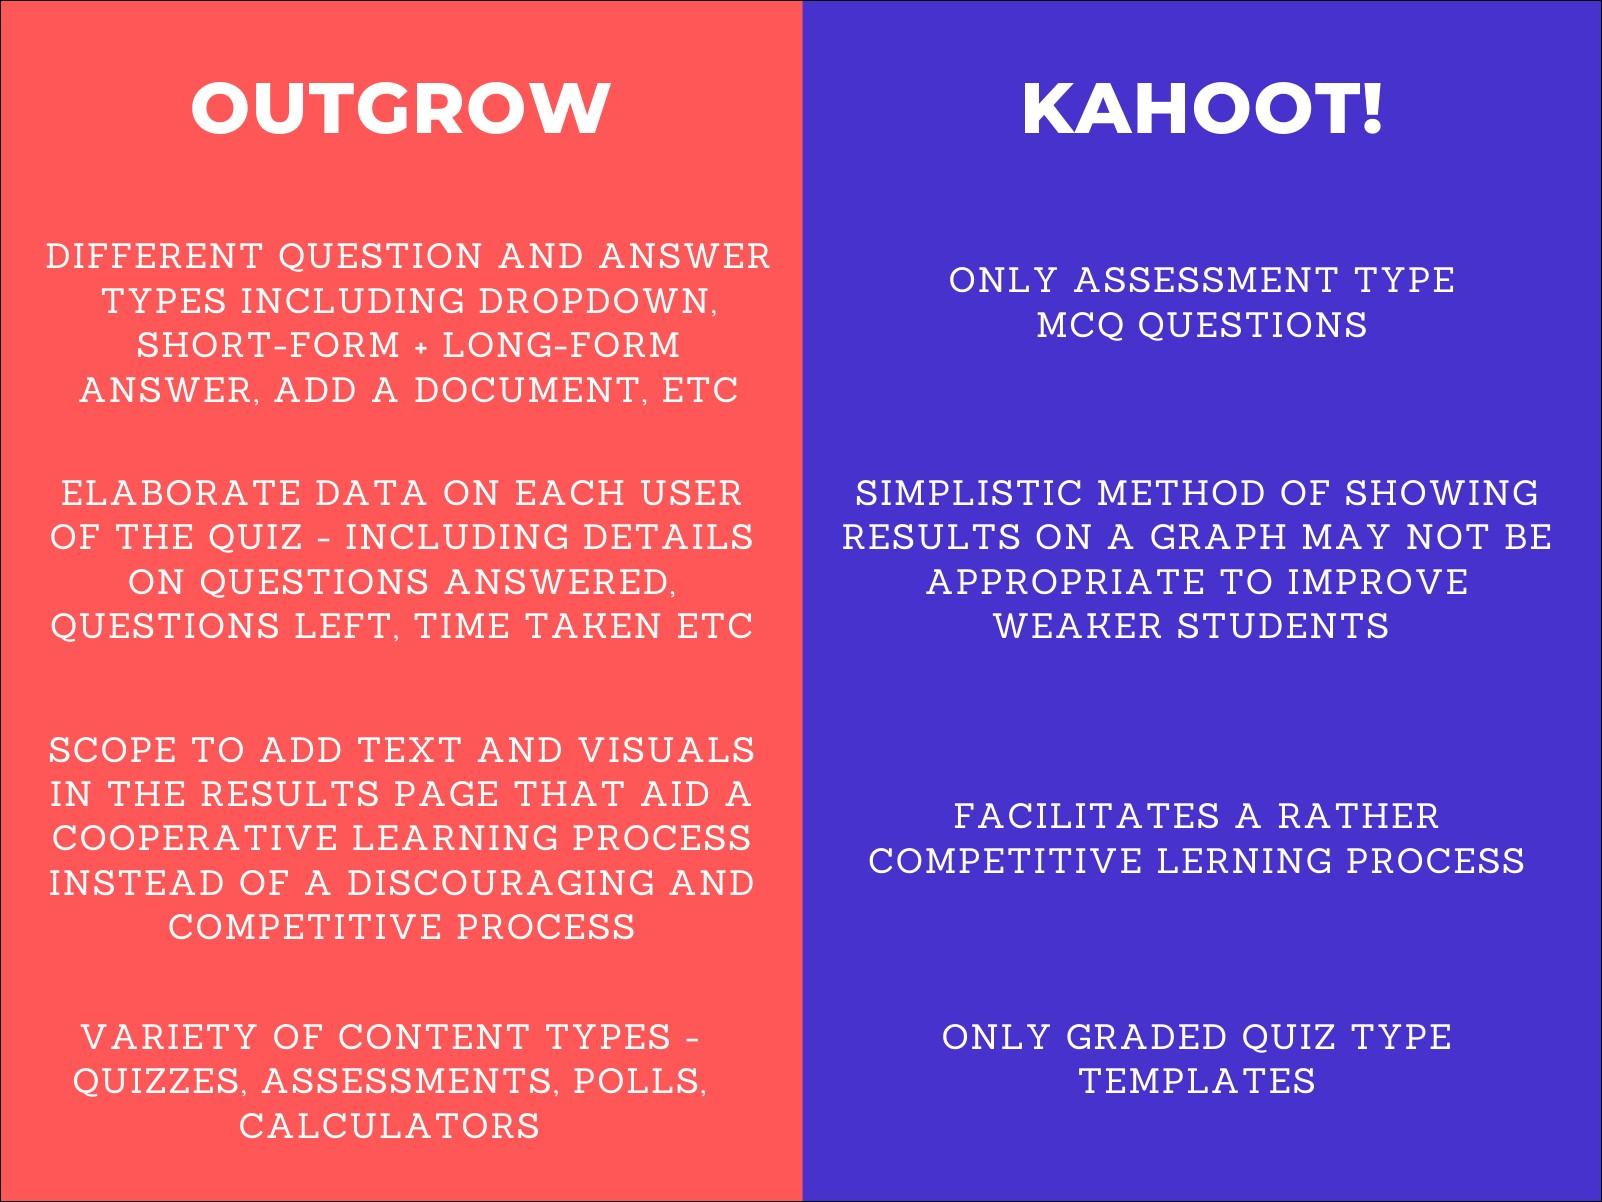 Kahoot-style quiz